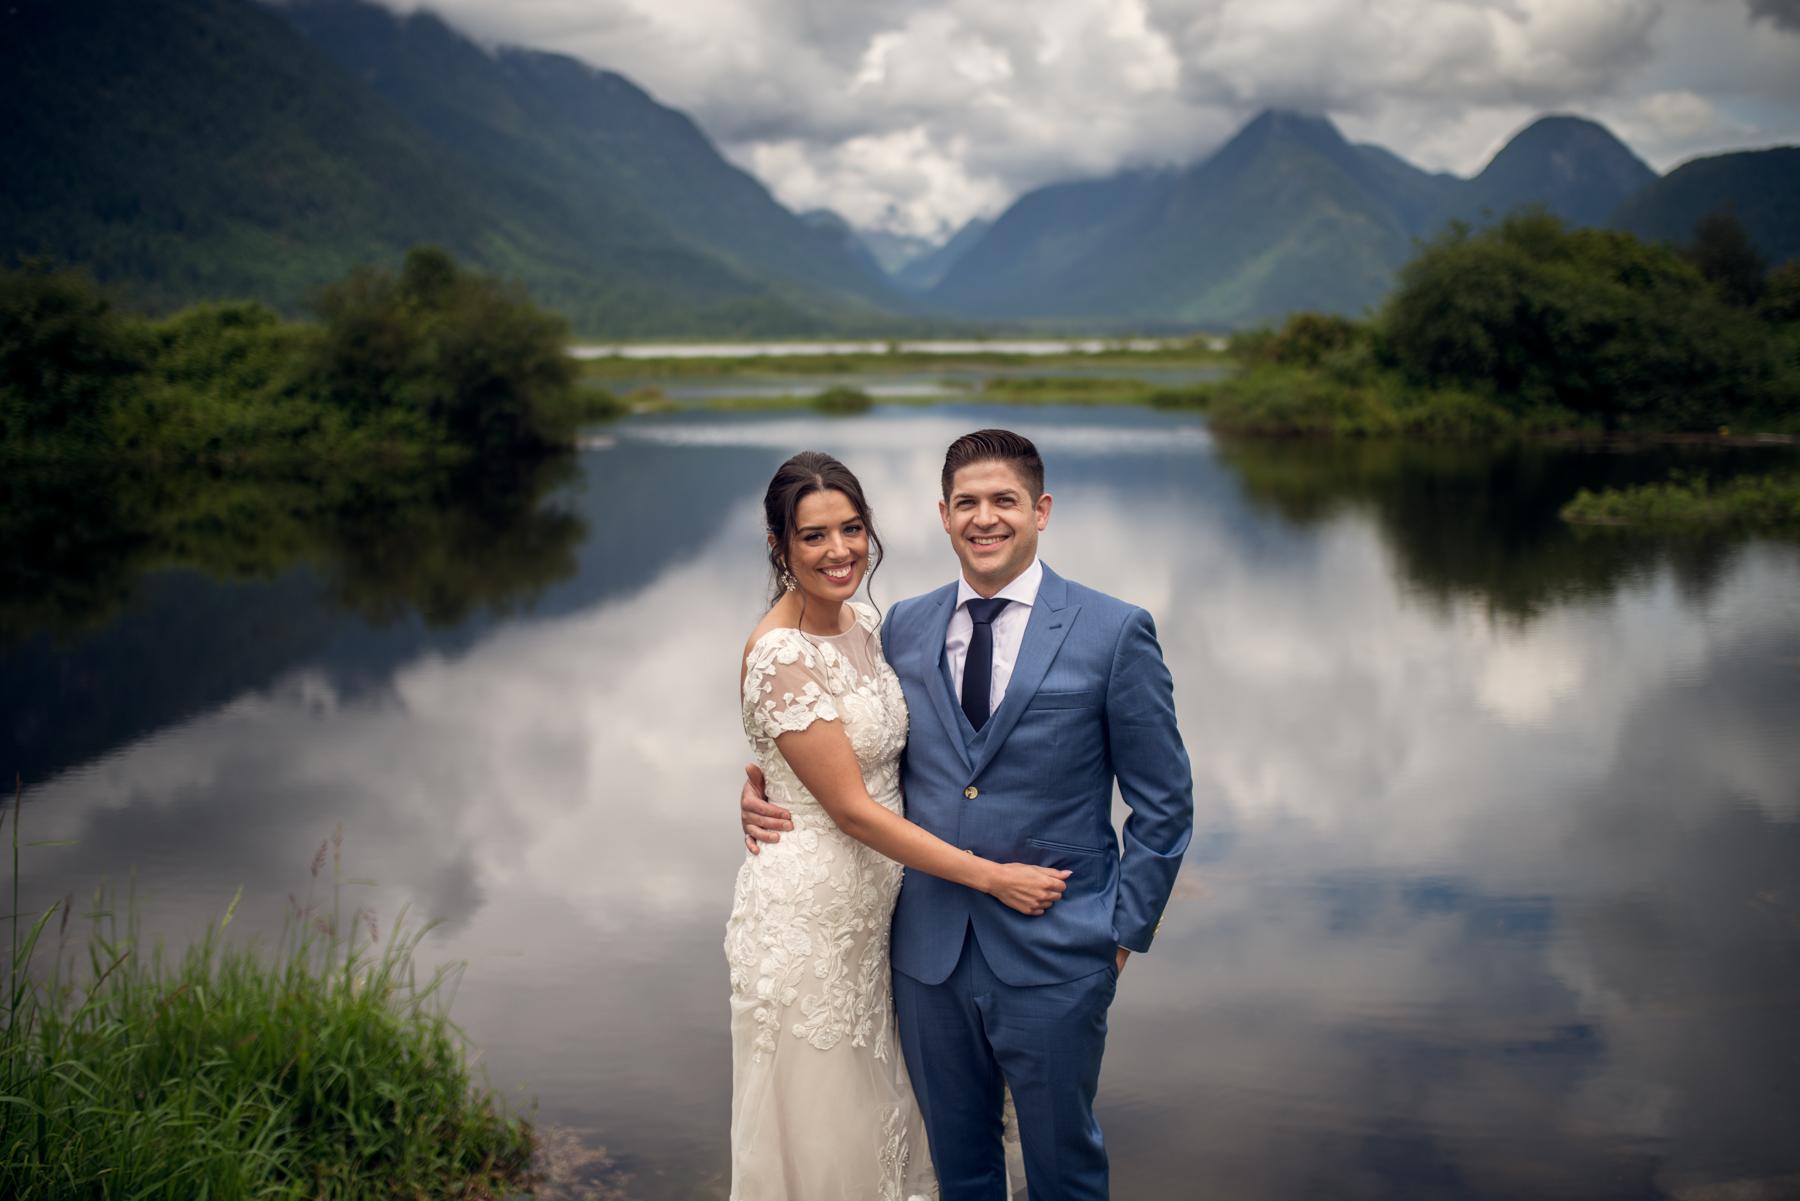 dp-wedding-web-018